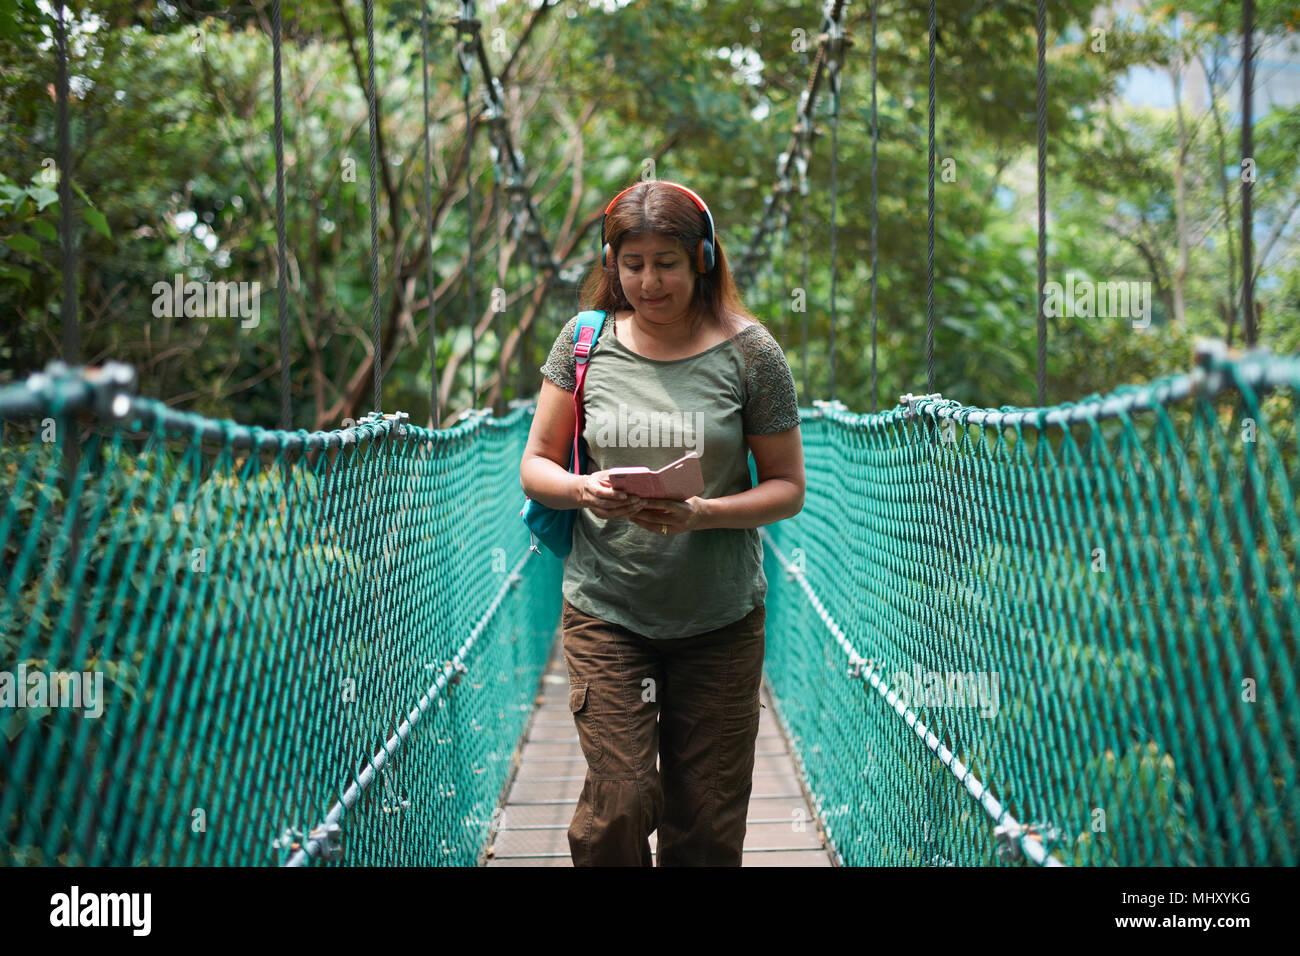 Tourist on bridge, KL Forest Eco Park, Kuala Lumpur, Malaysia - Stock Image